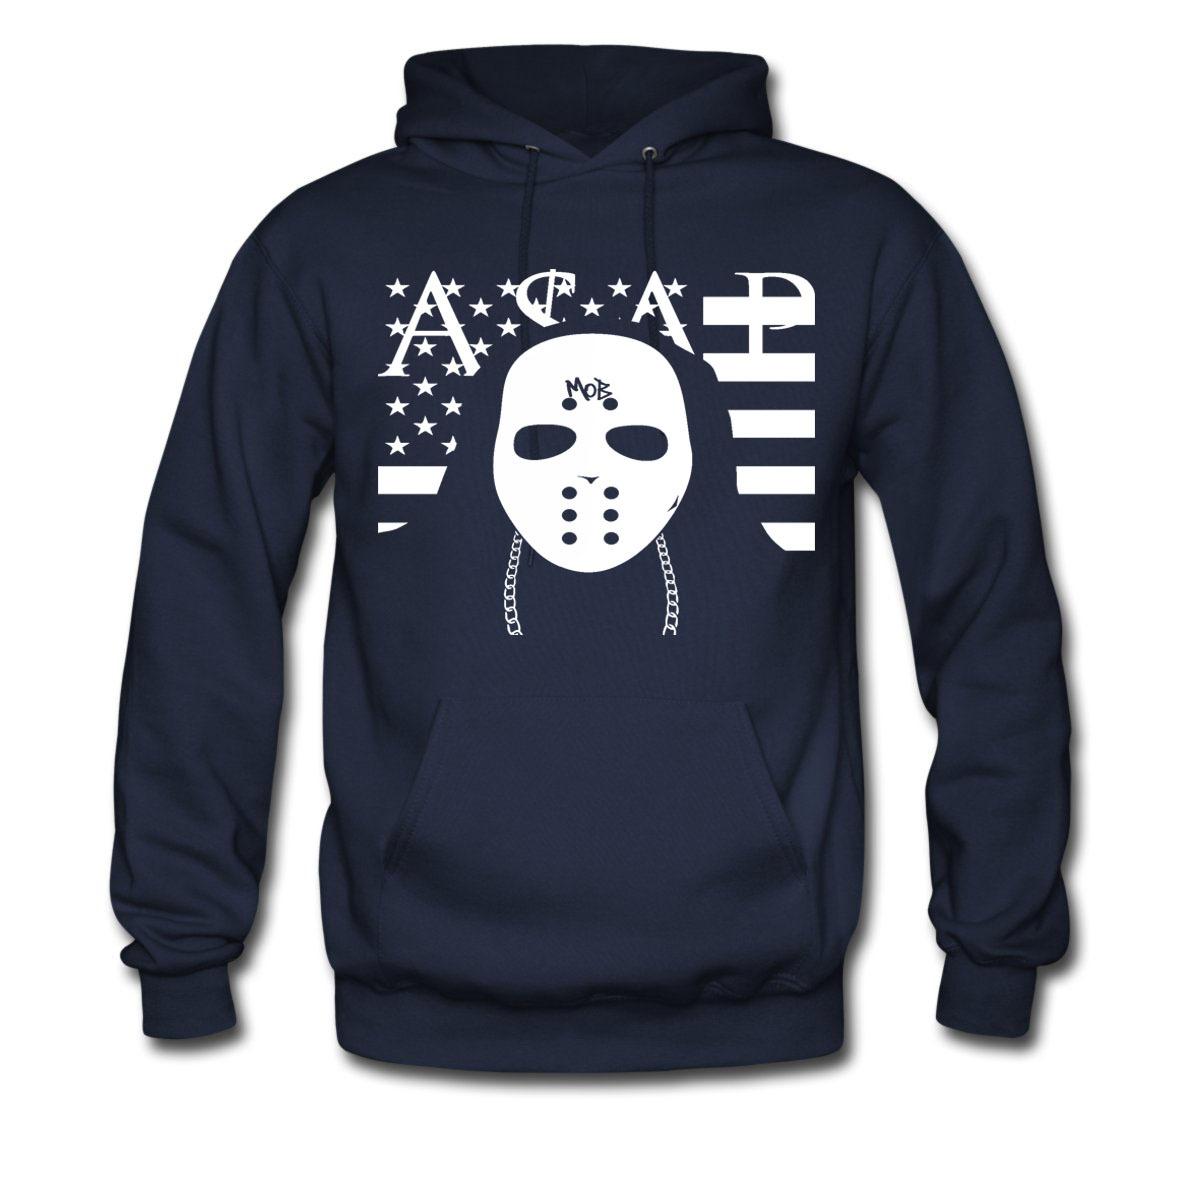 Asap rocky hoodie